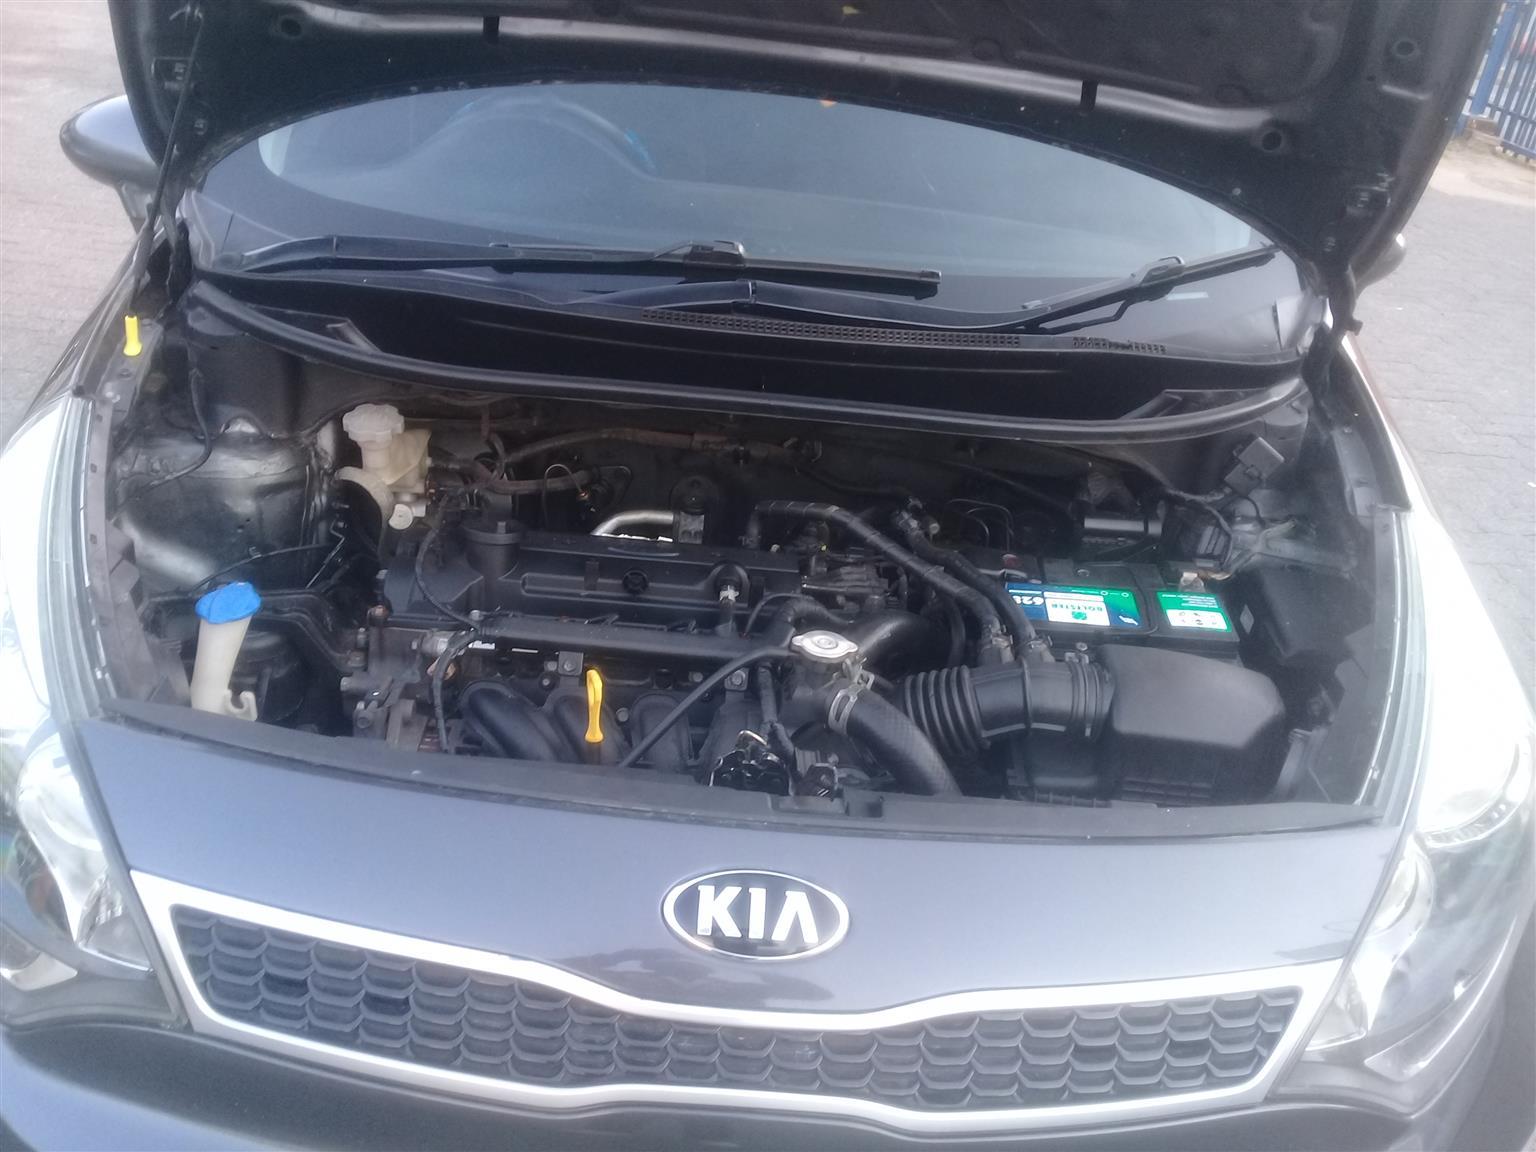 2016 Kia Rio hatch 1.2 LS